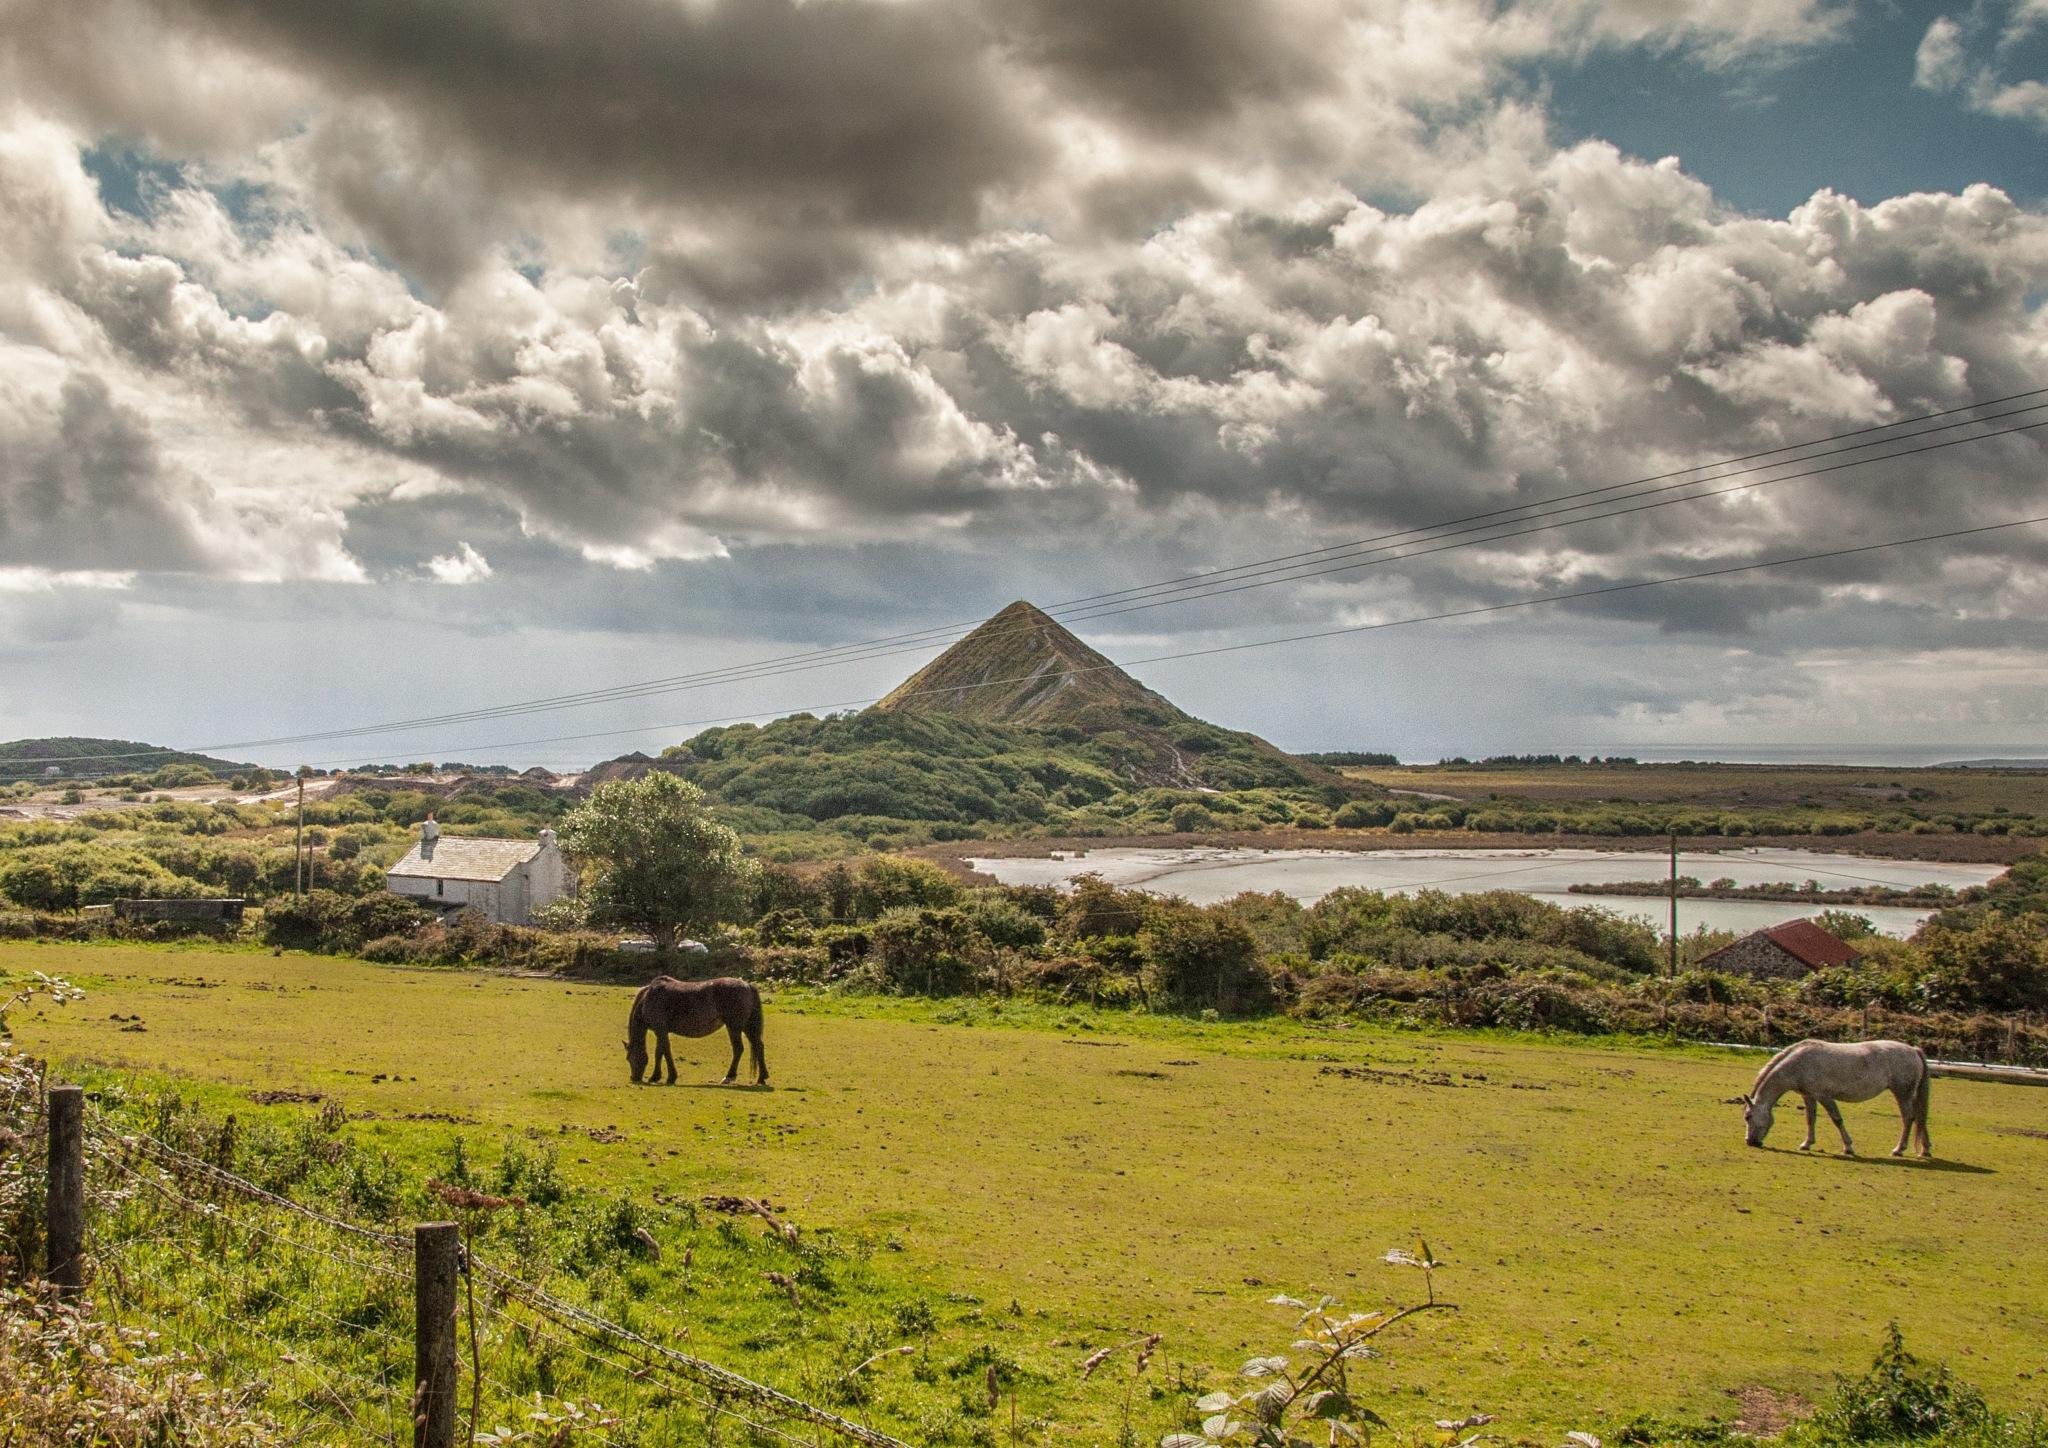 Cornish Landscape by Jim Obee